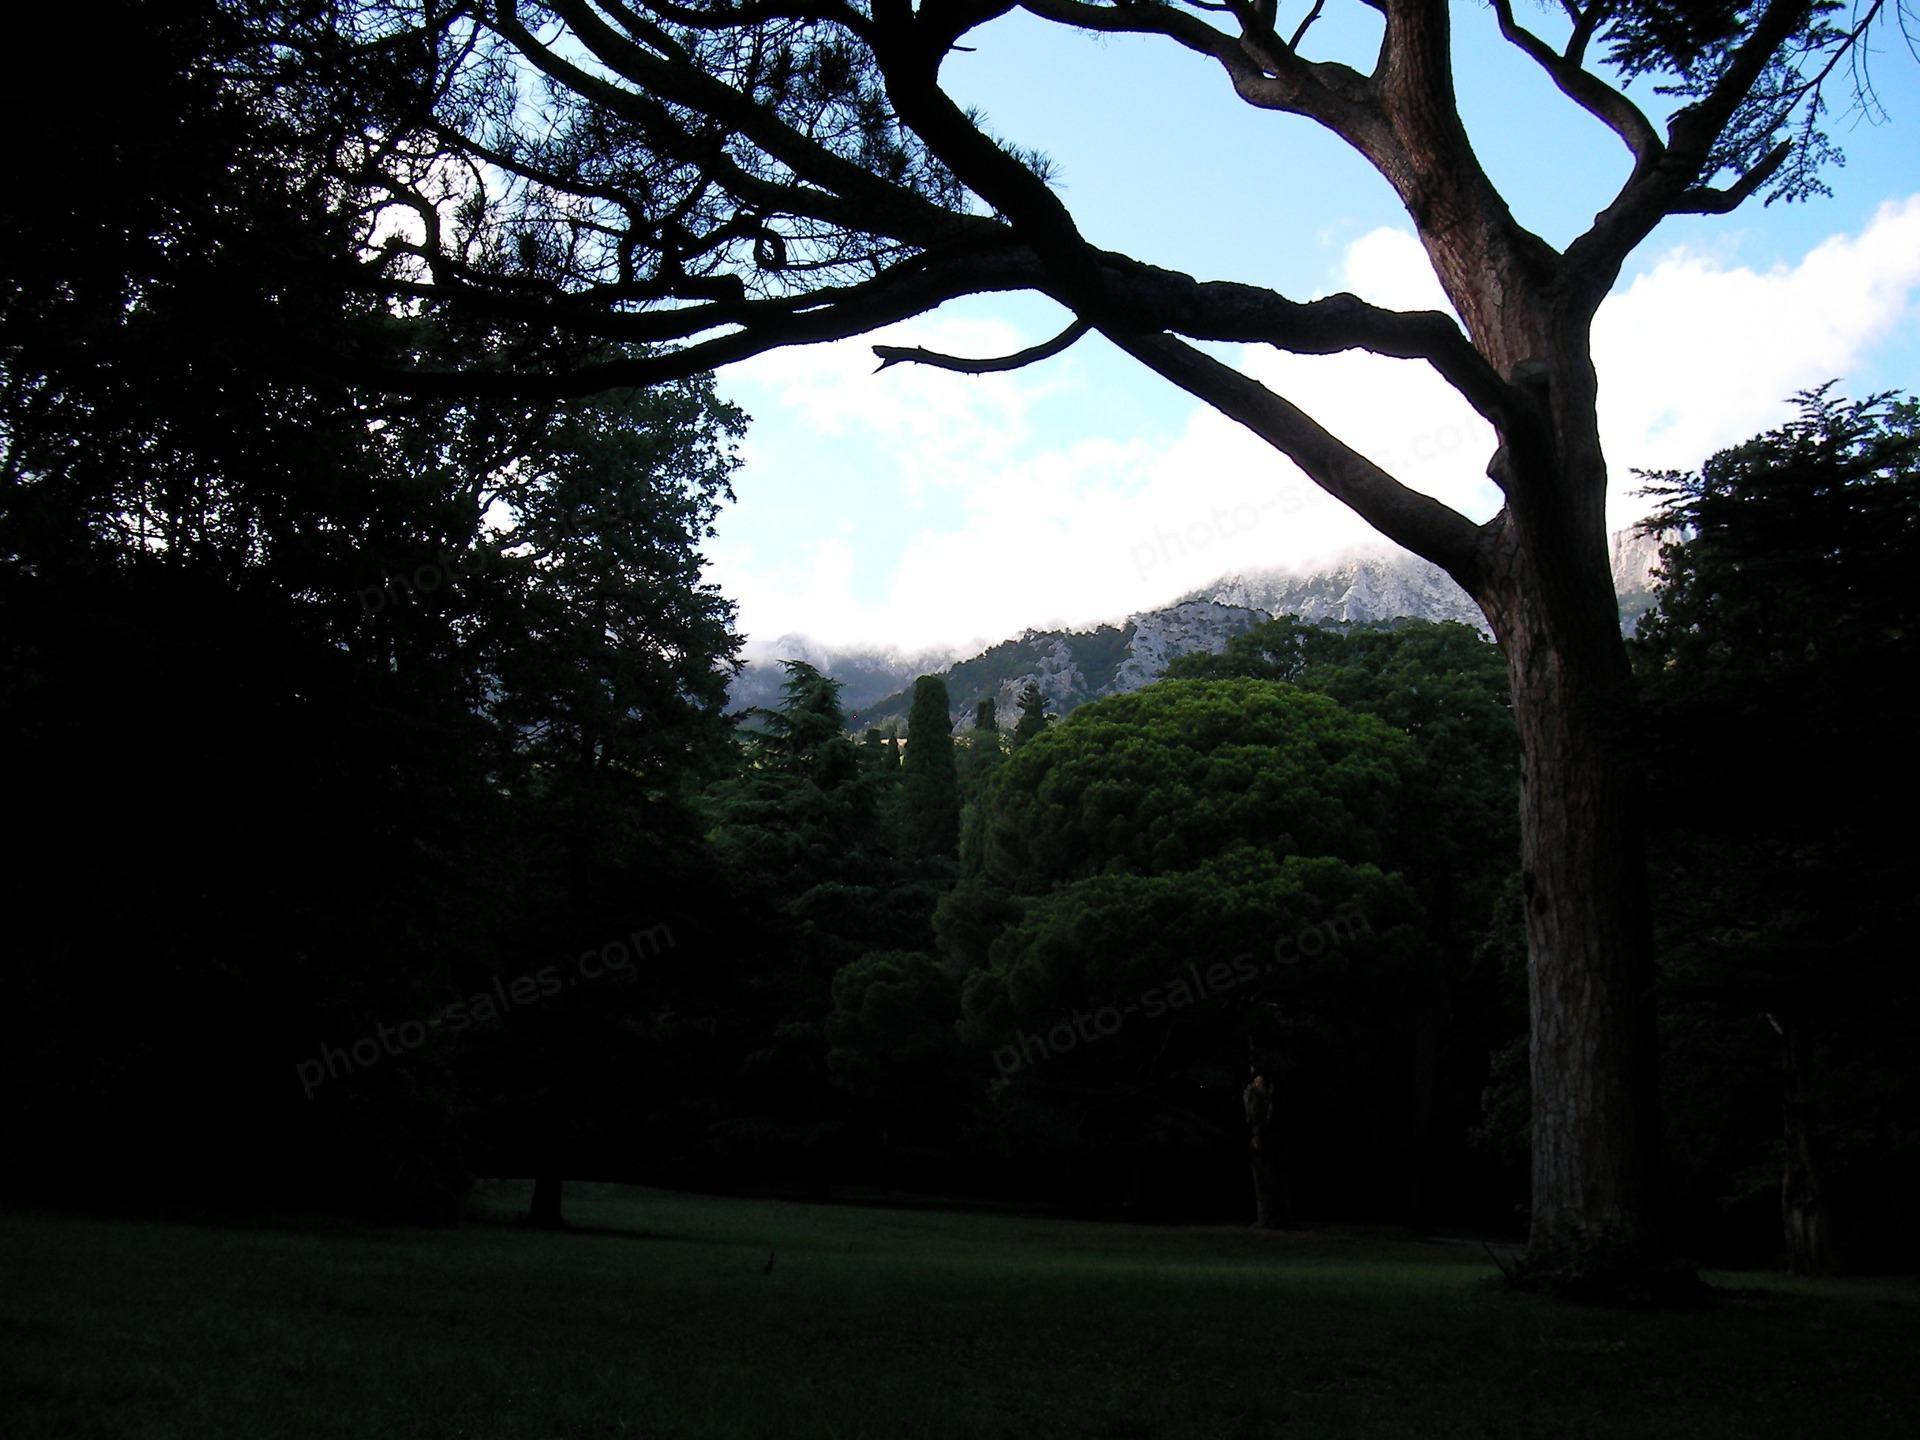 Tree in Vorontsov park, Crimea